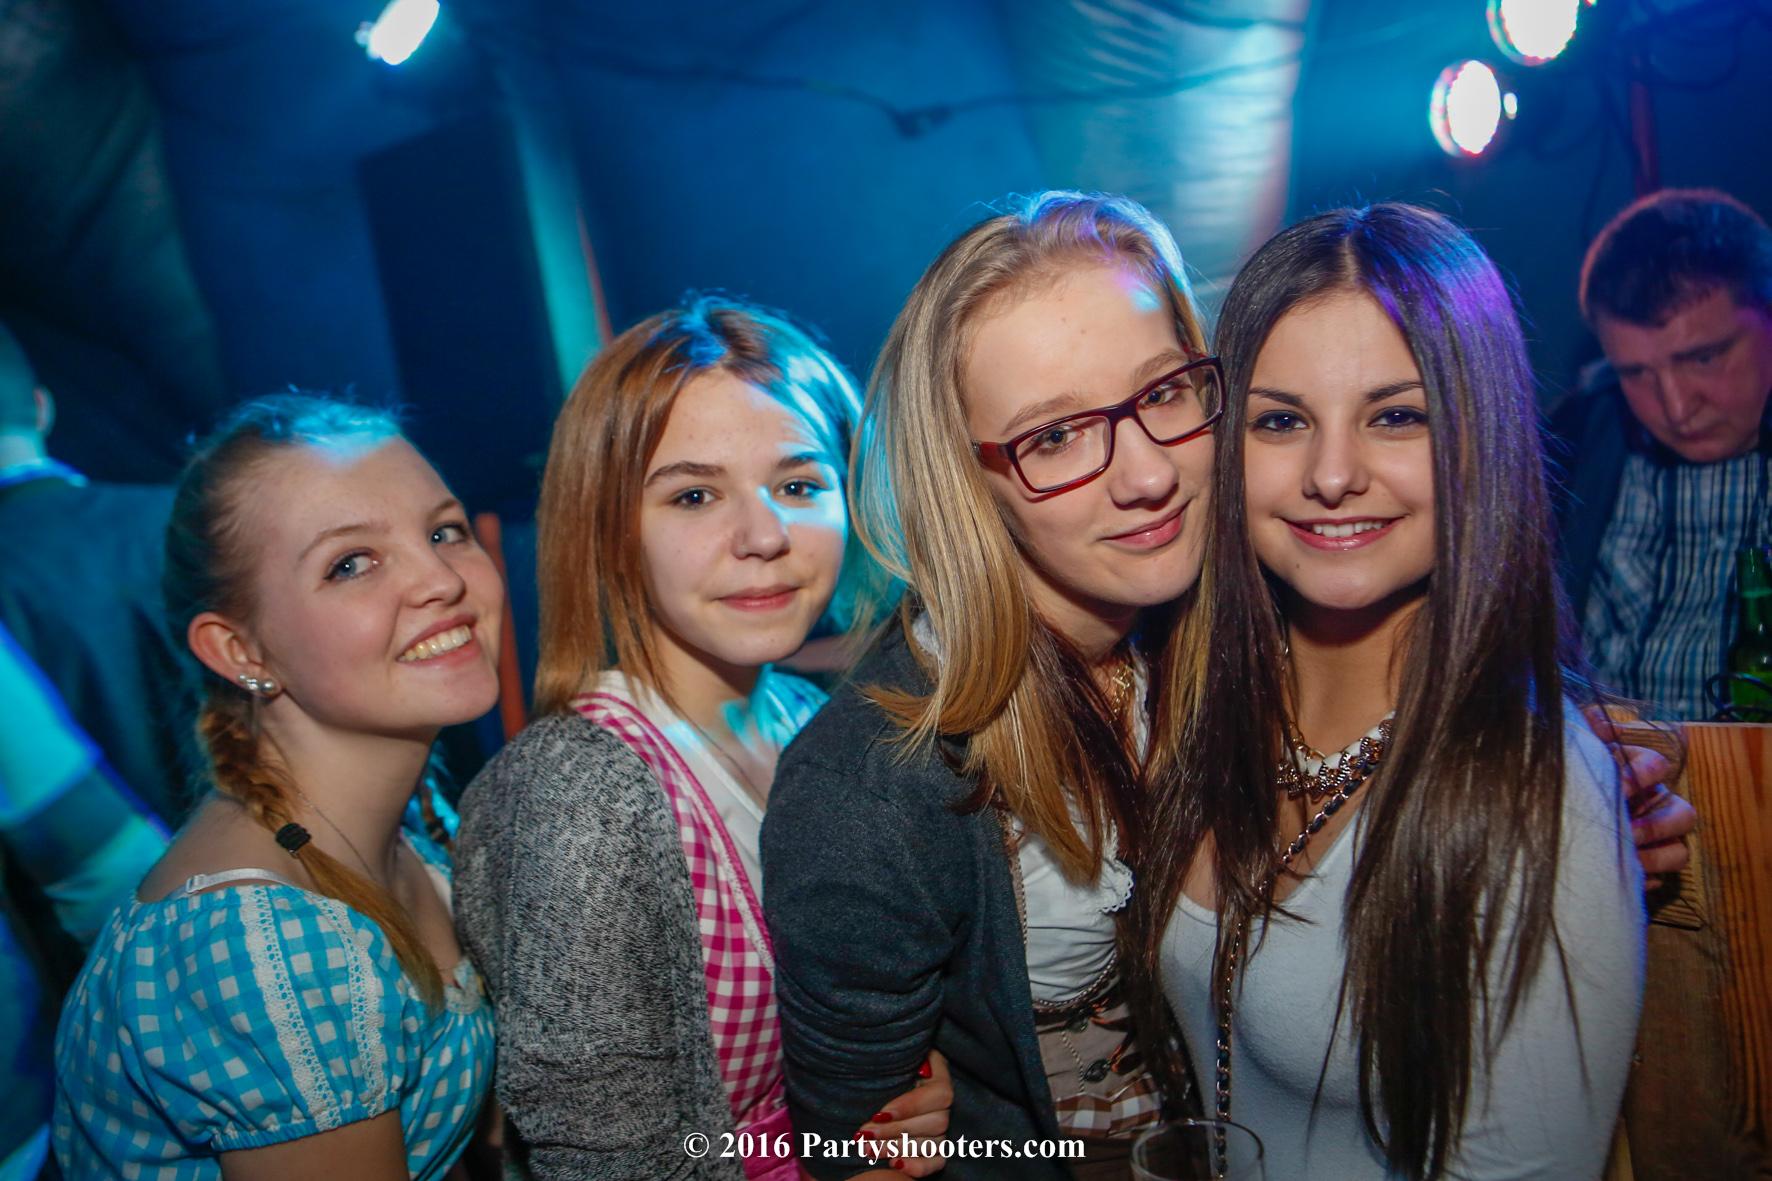 0103 - 4064 - Fruehlingsball Aspach